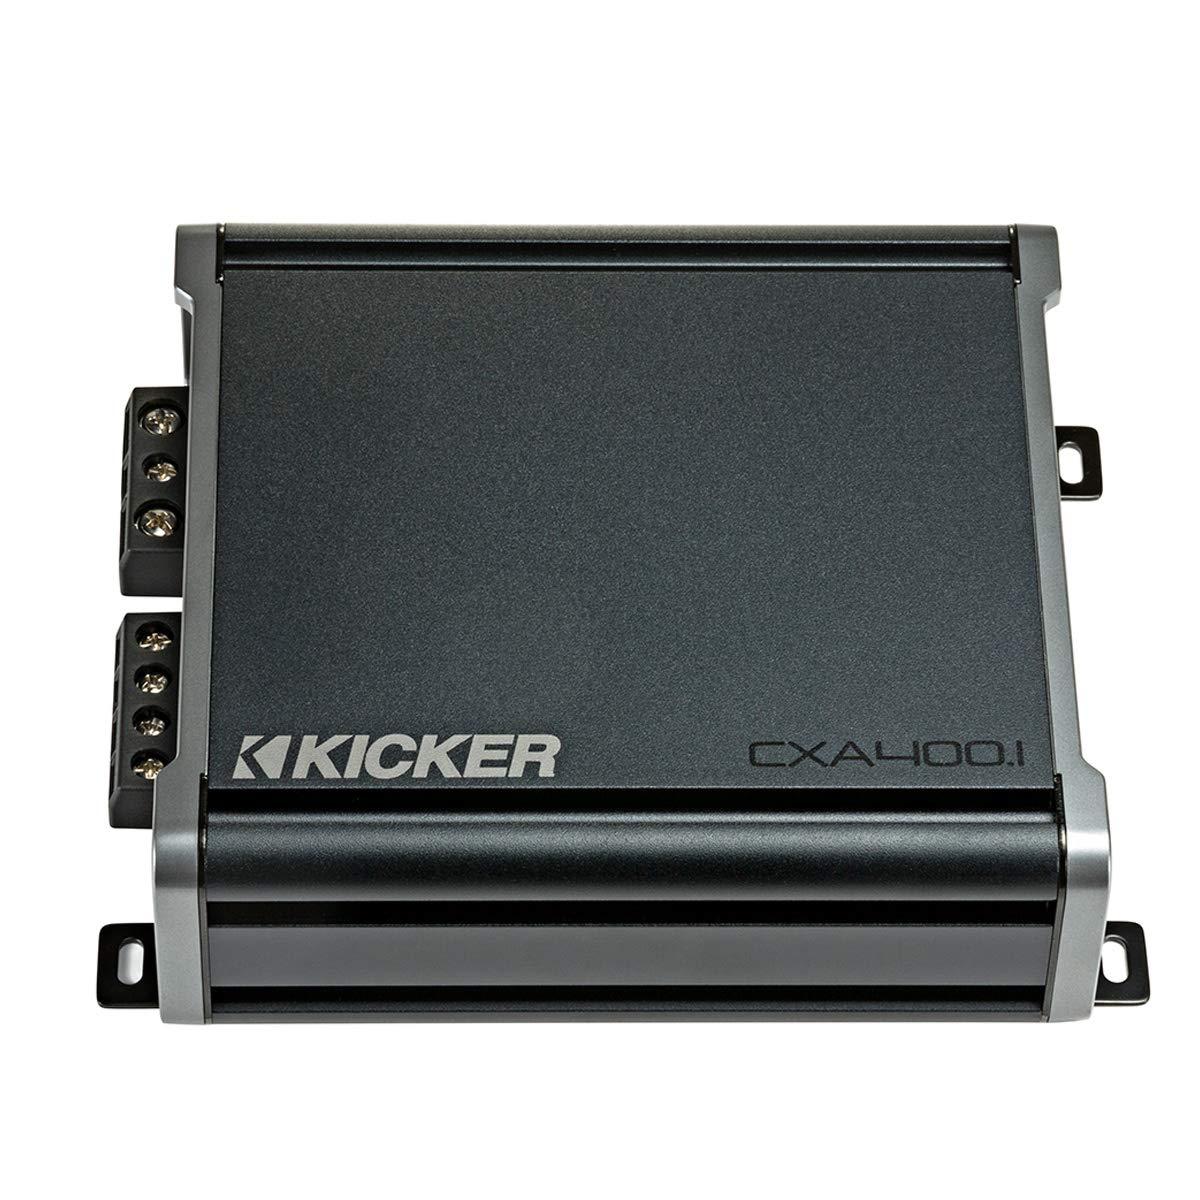 Kicker 46CXA4001 Car Audio Class D Amp Mono 800W Peak Sub Amplifier CXA400.1 New by KICKER